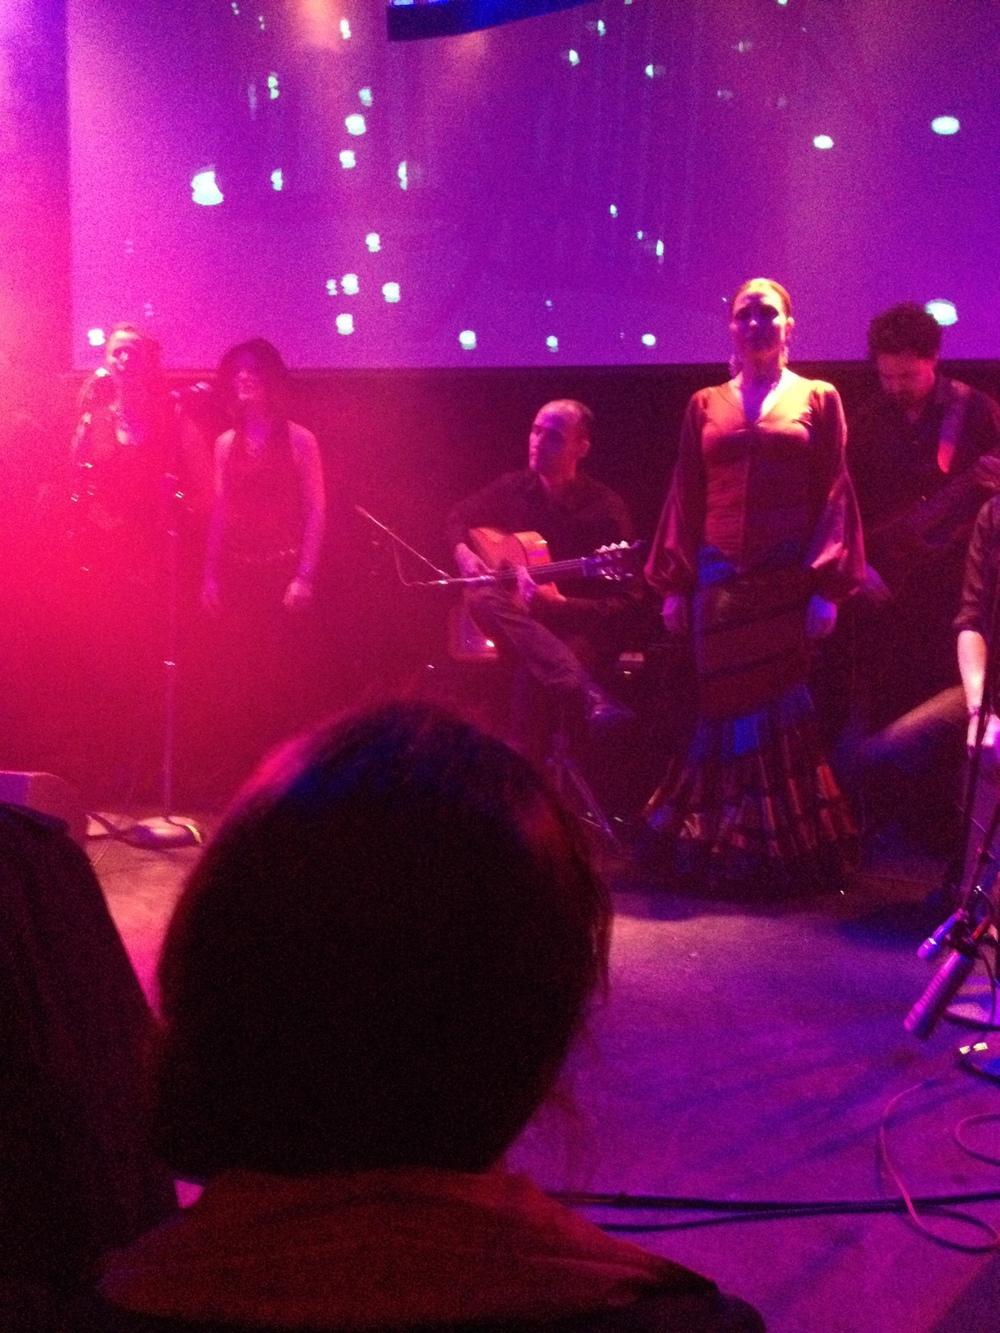 Flamenco dancer! Told you so.